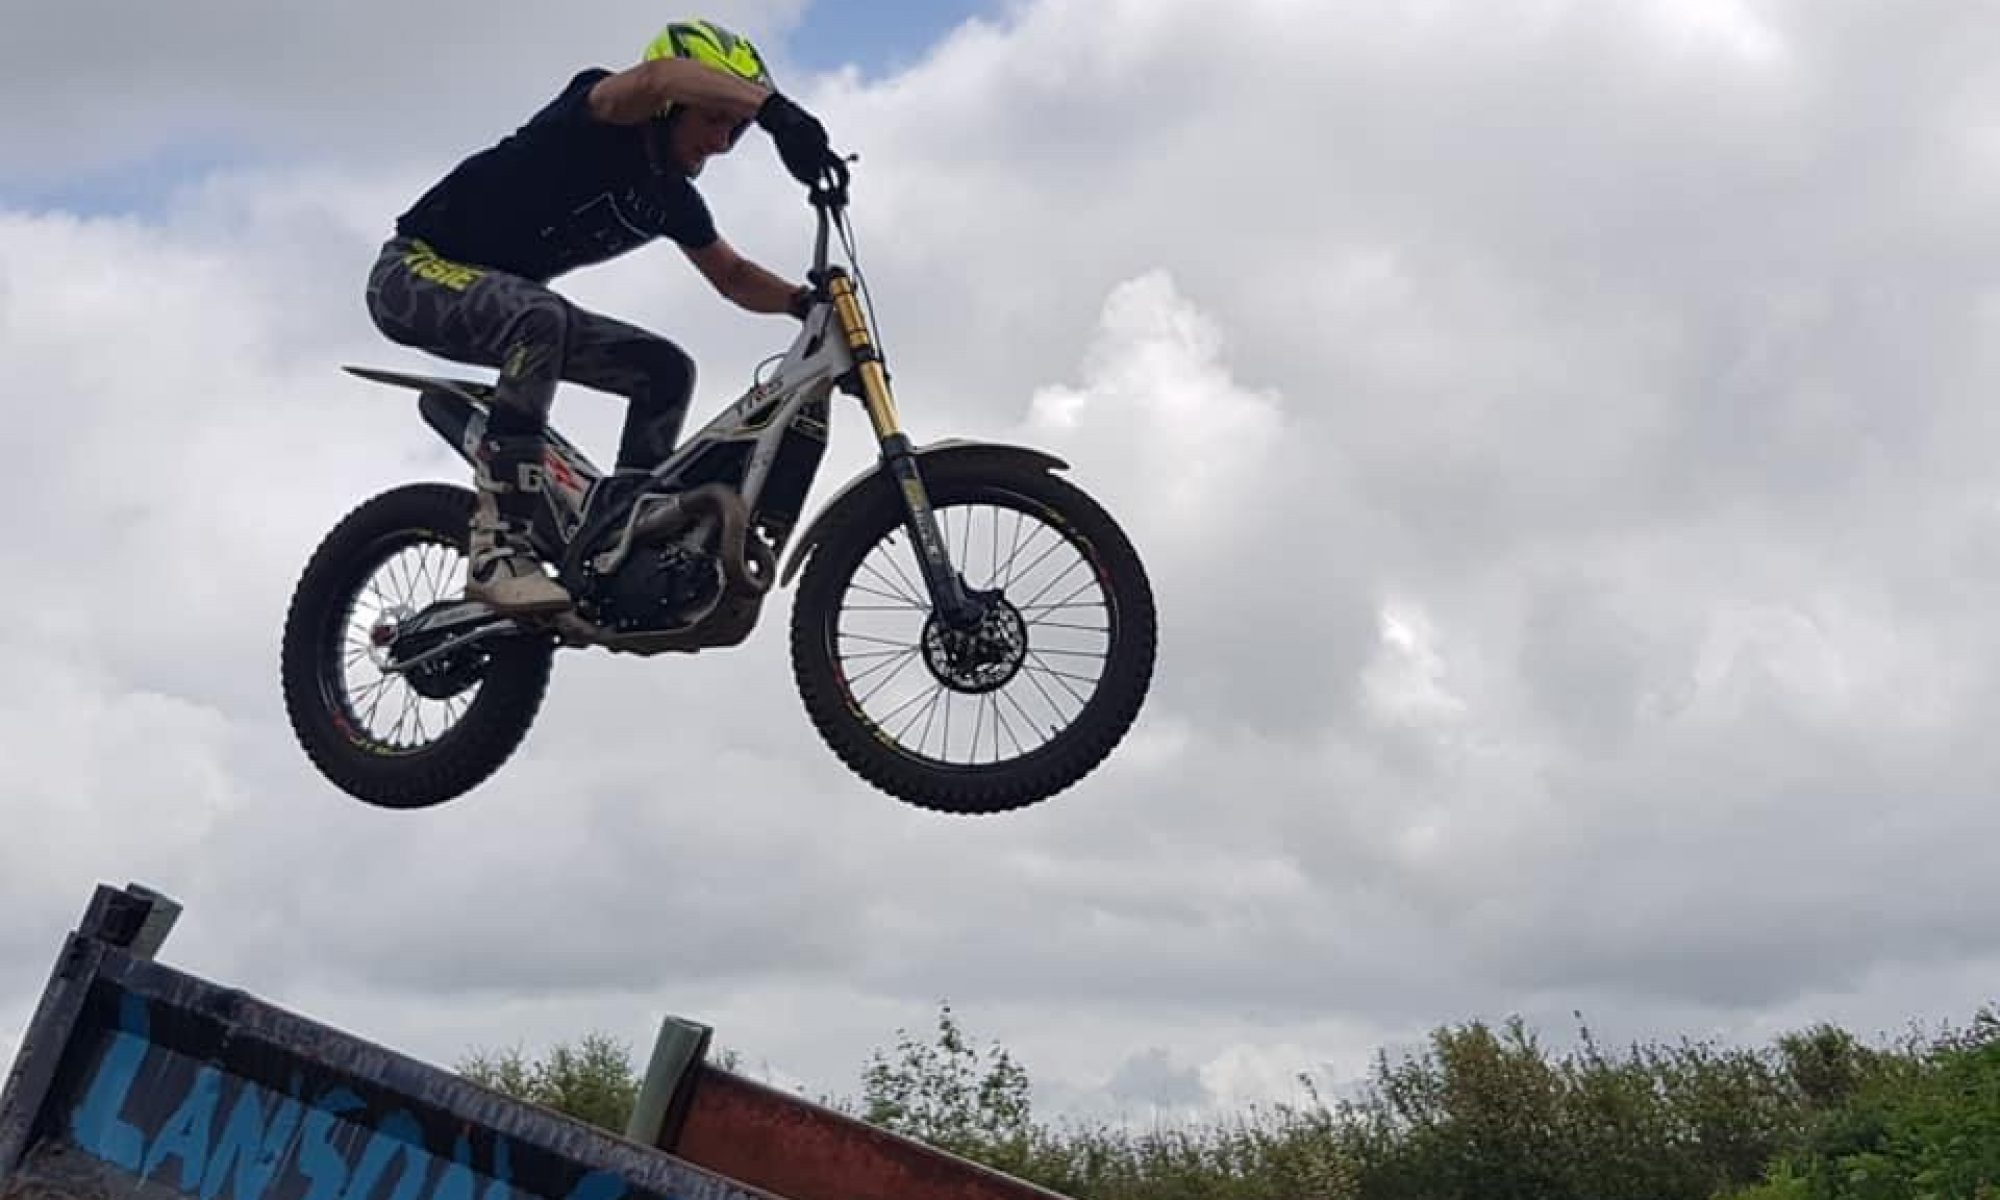 Launceston Motorcycle Club